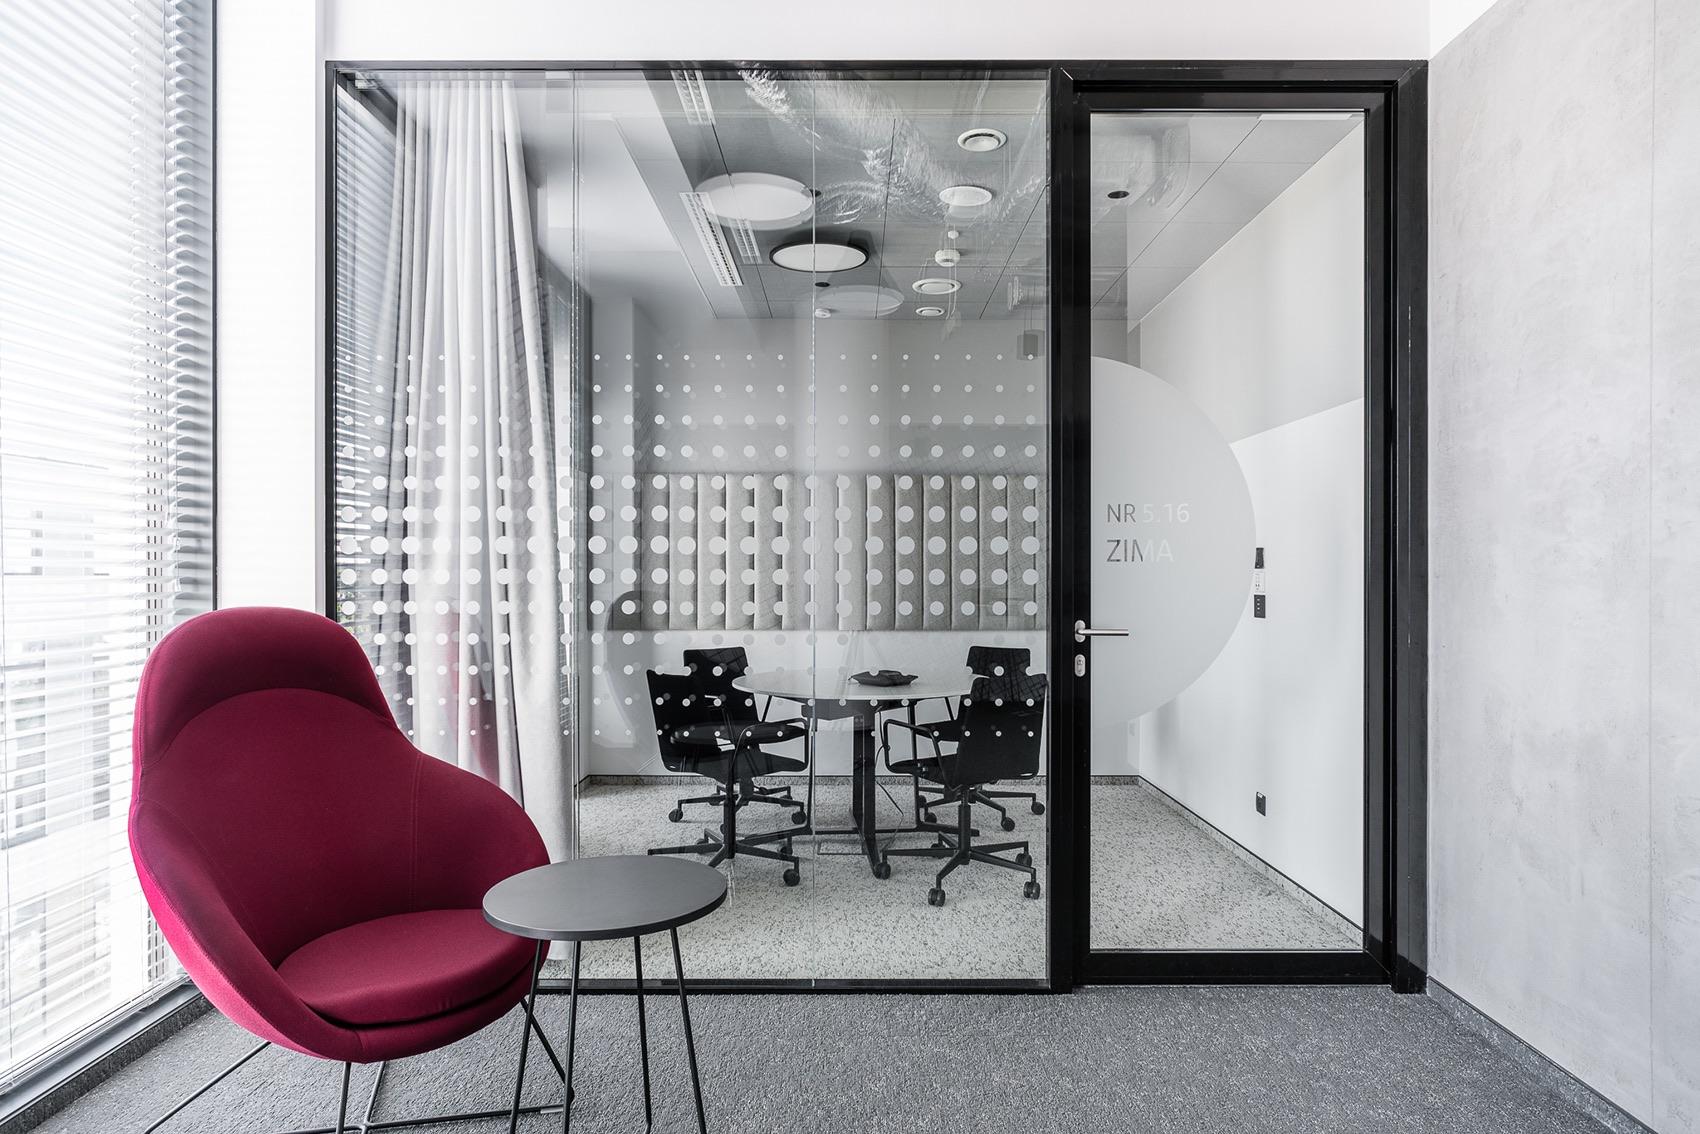 santander-office-lublin-18